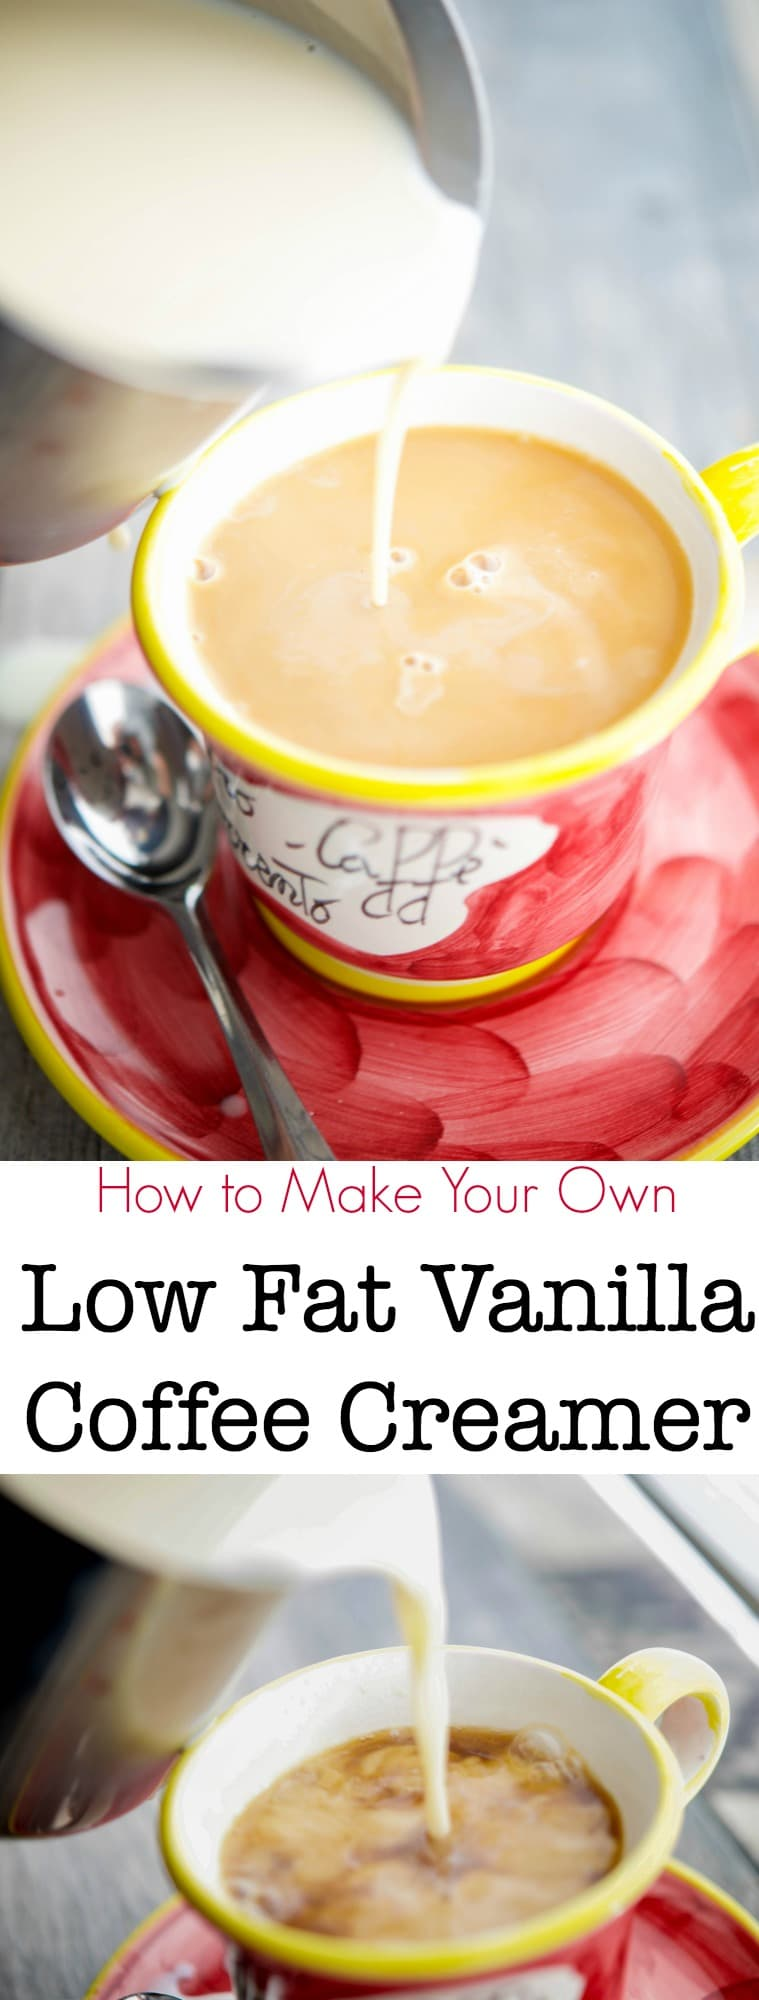 learn how to make coffee